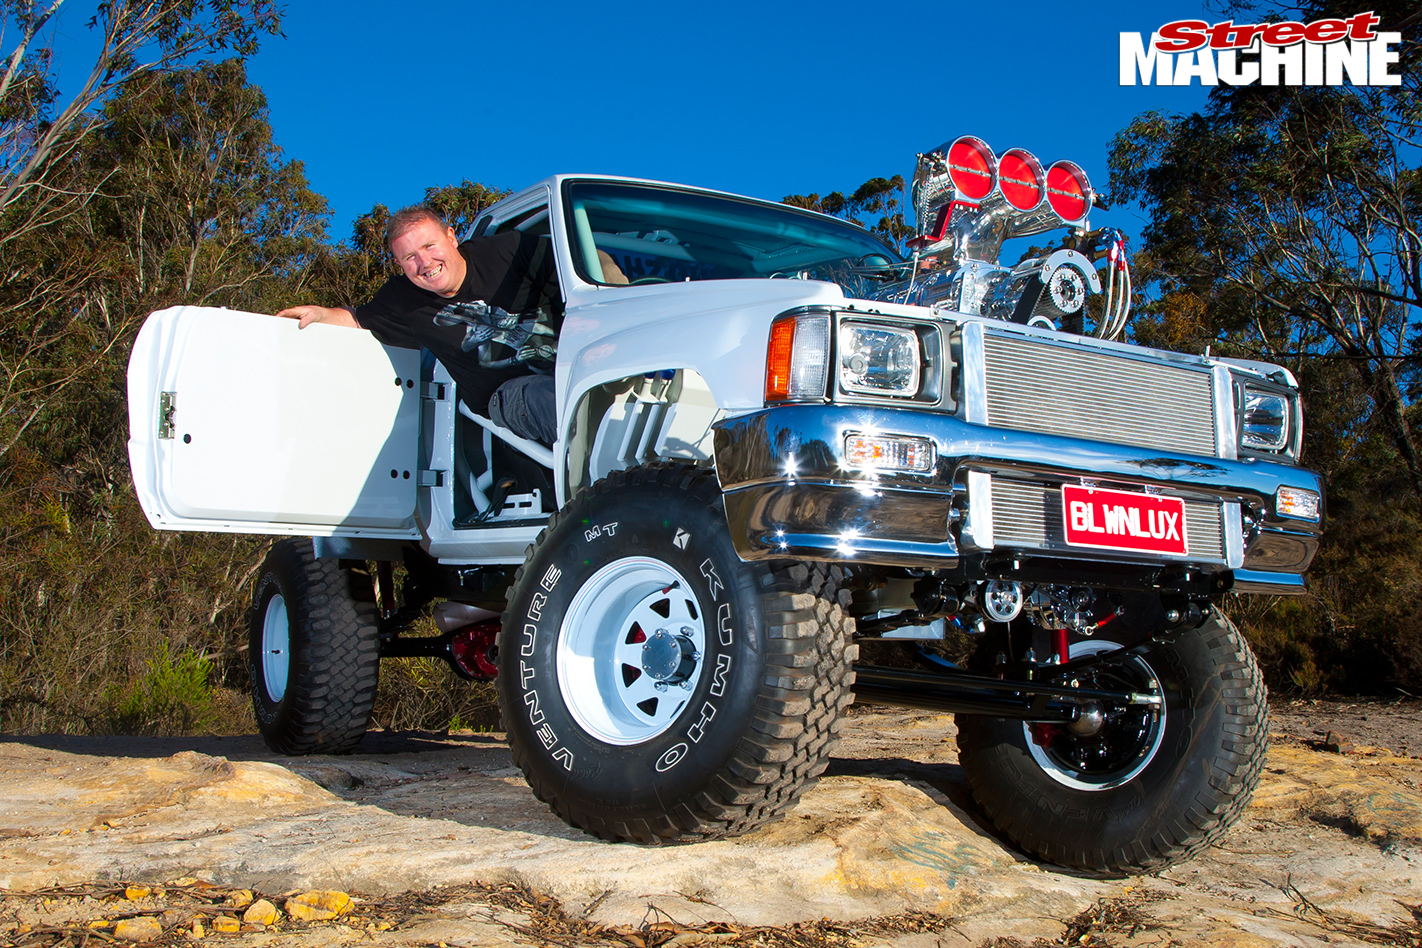 Toyota -Hilux -main -Brett -Battersby -2